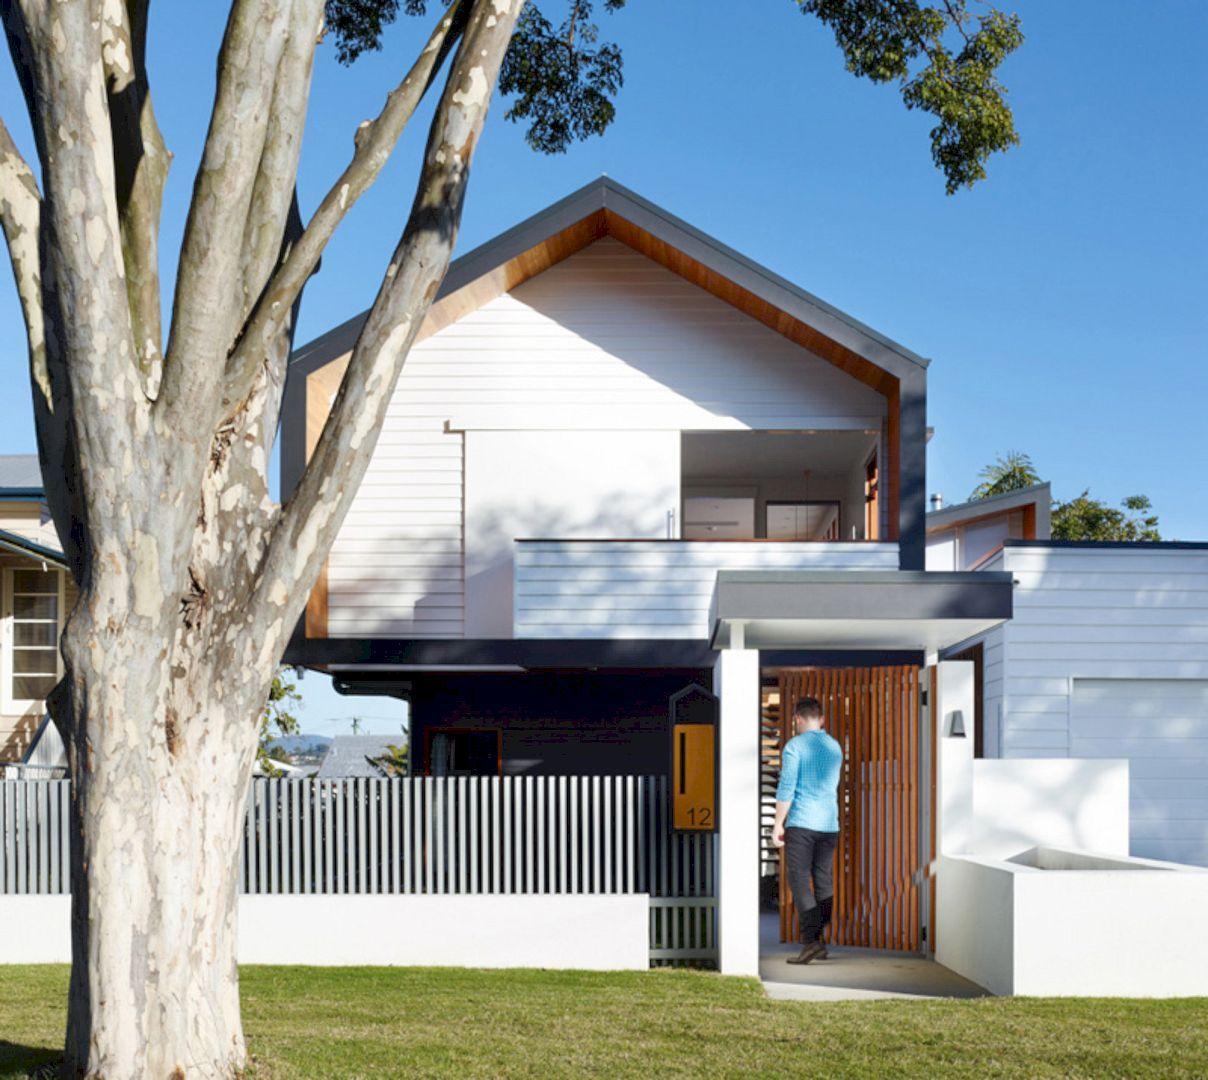 Home Design Ideas Australia: 10 Amazing Modern House Designs